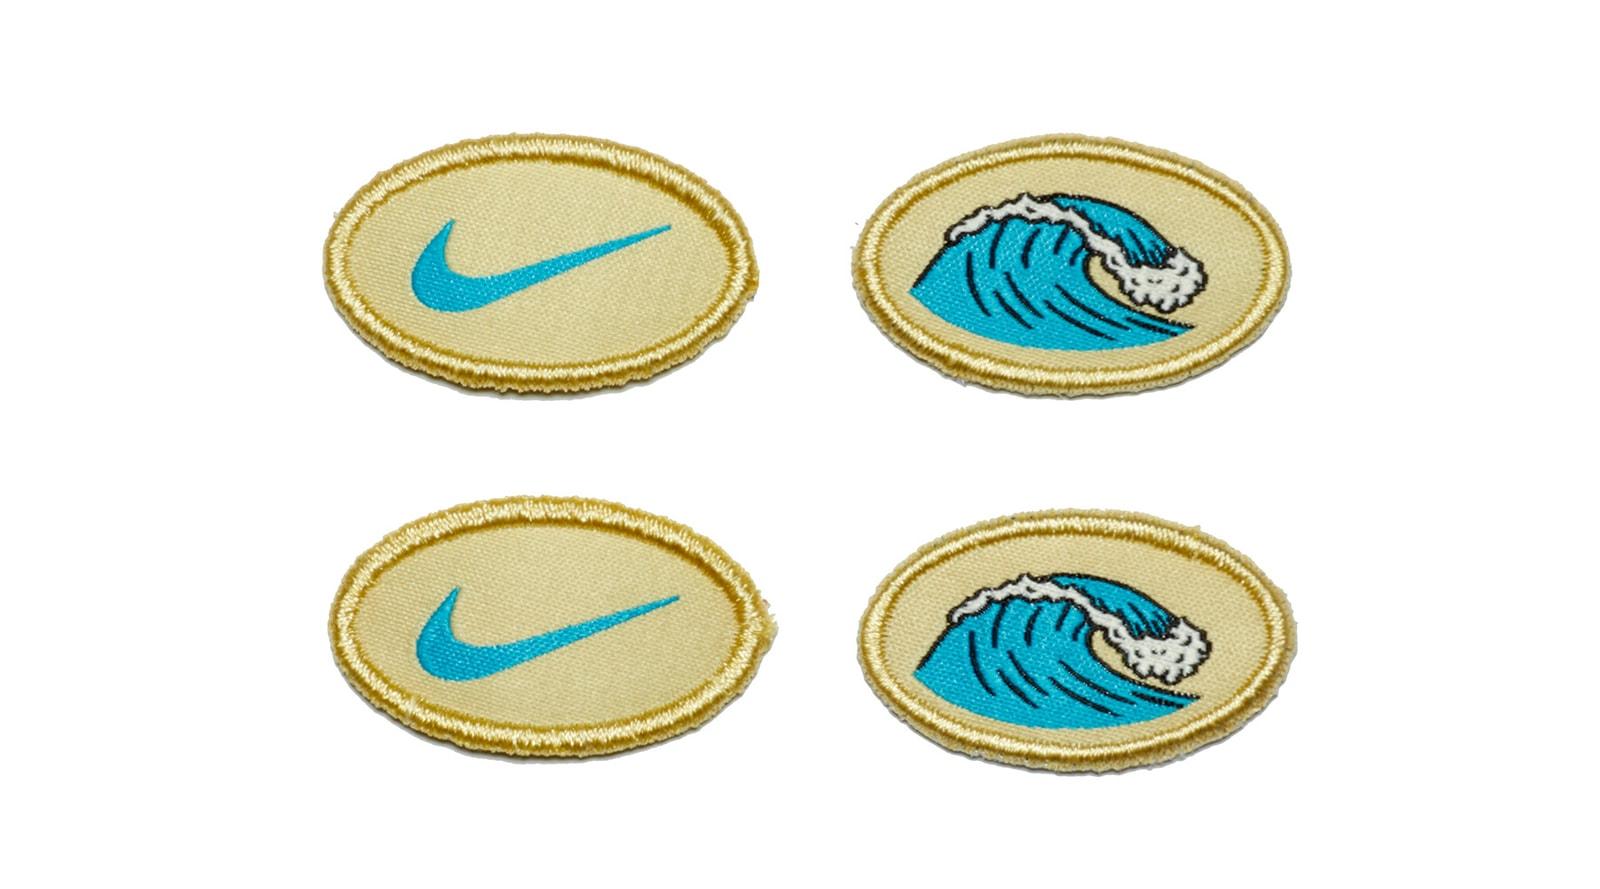 Nike が Air Max Day 2018 ラインアップに並ぶ残り3型の日本発売情報を解禁 ナイキ エア マックス デー スニーカー HYPEBEAST ハイプビースト